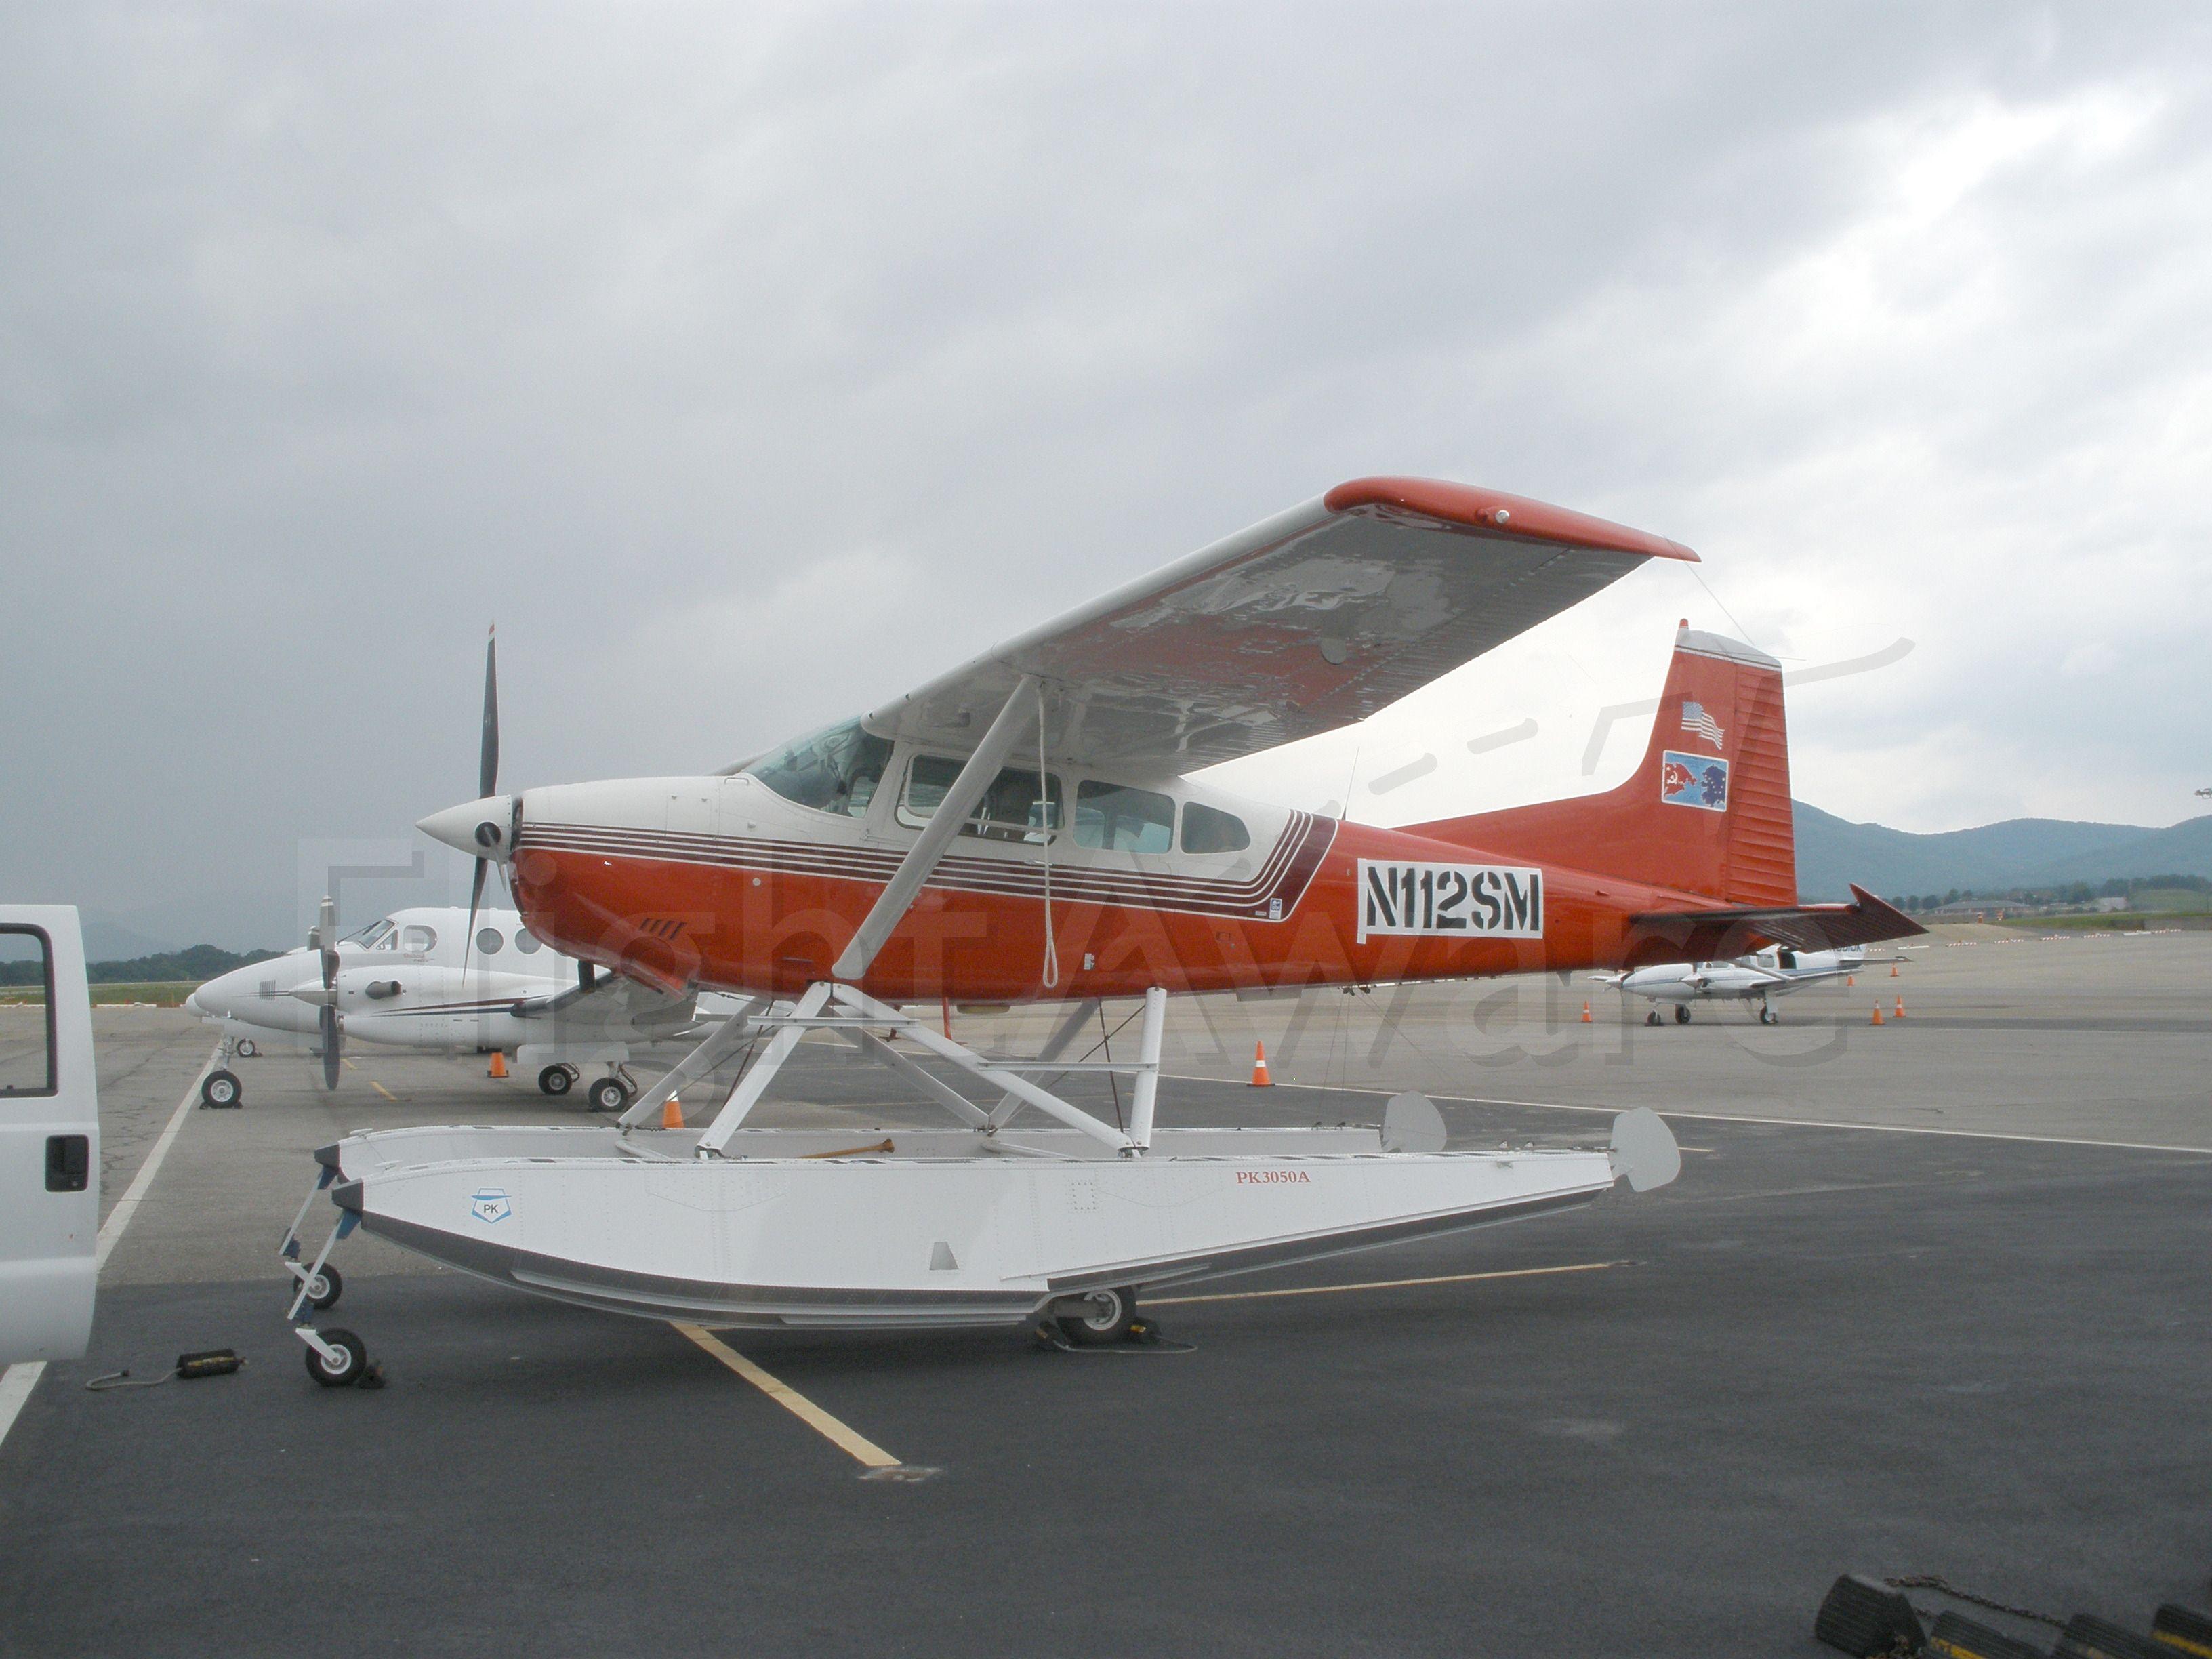 Cessna Skywagon (N112SM) - Beautiful historic Cessna